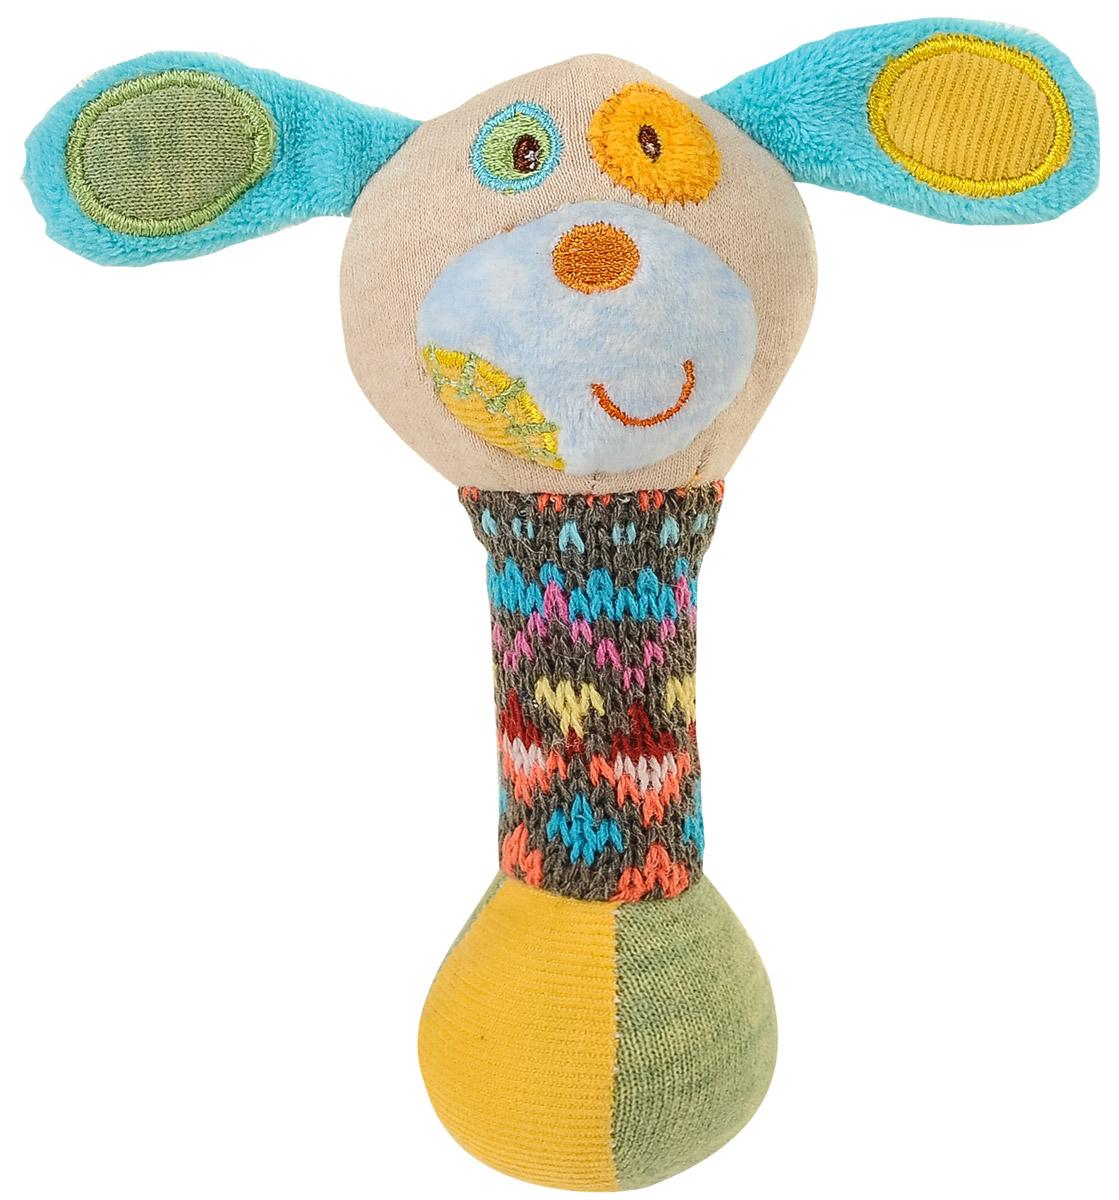 BabyOno Игрушка-пищалка Маленькая собачка babyono игрушка пищалка жираф